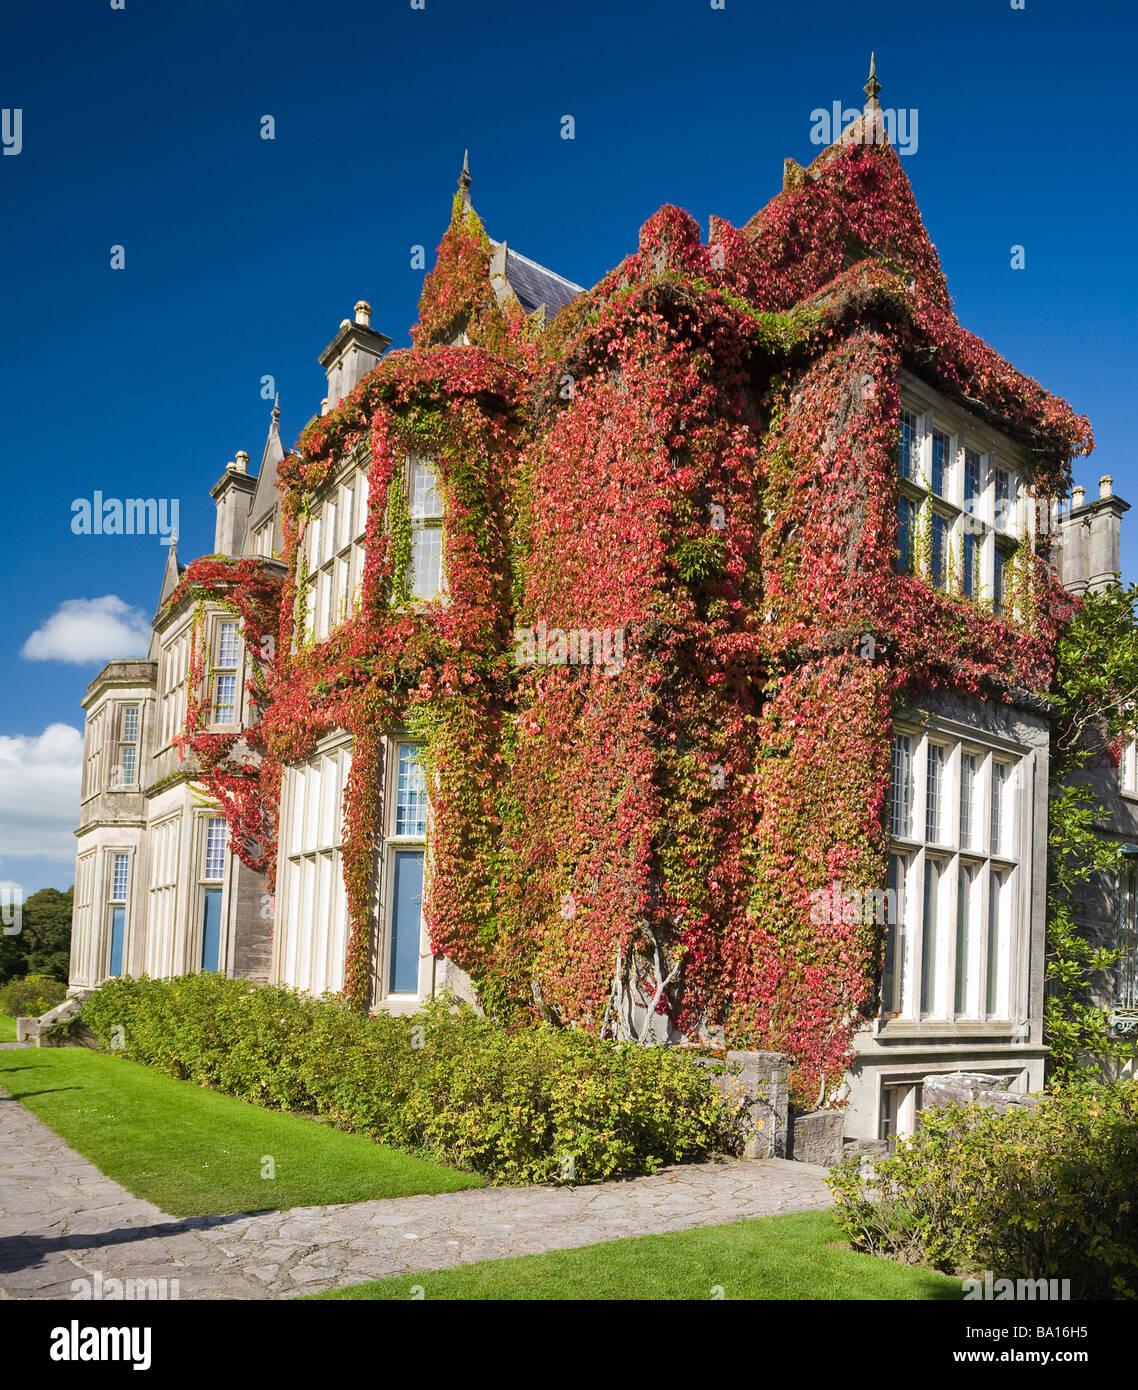 Vine Covered House Stock Photos  U0026 Vine Covered House Stock